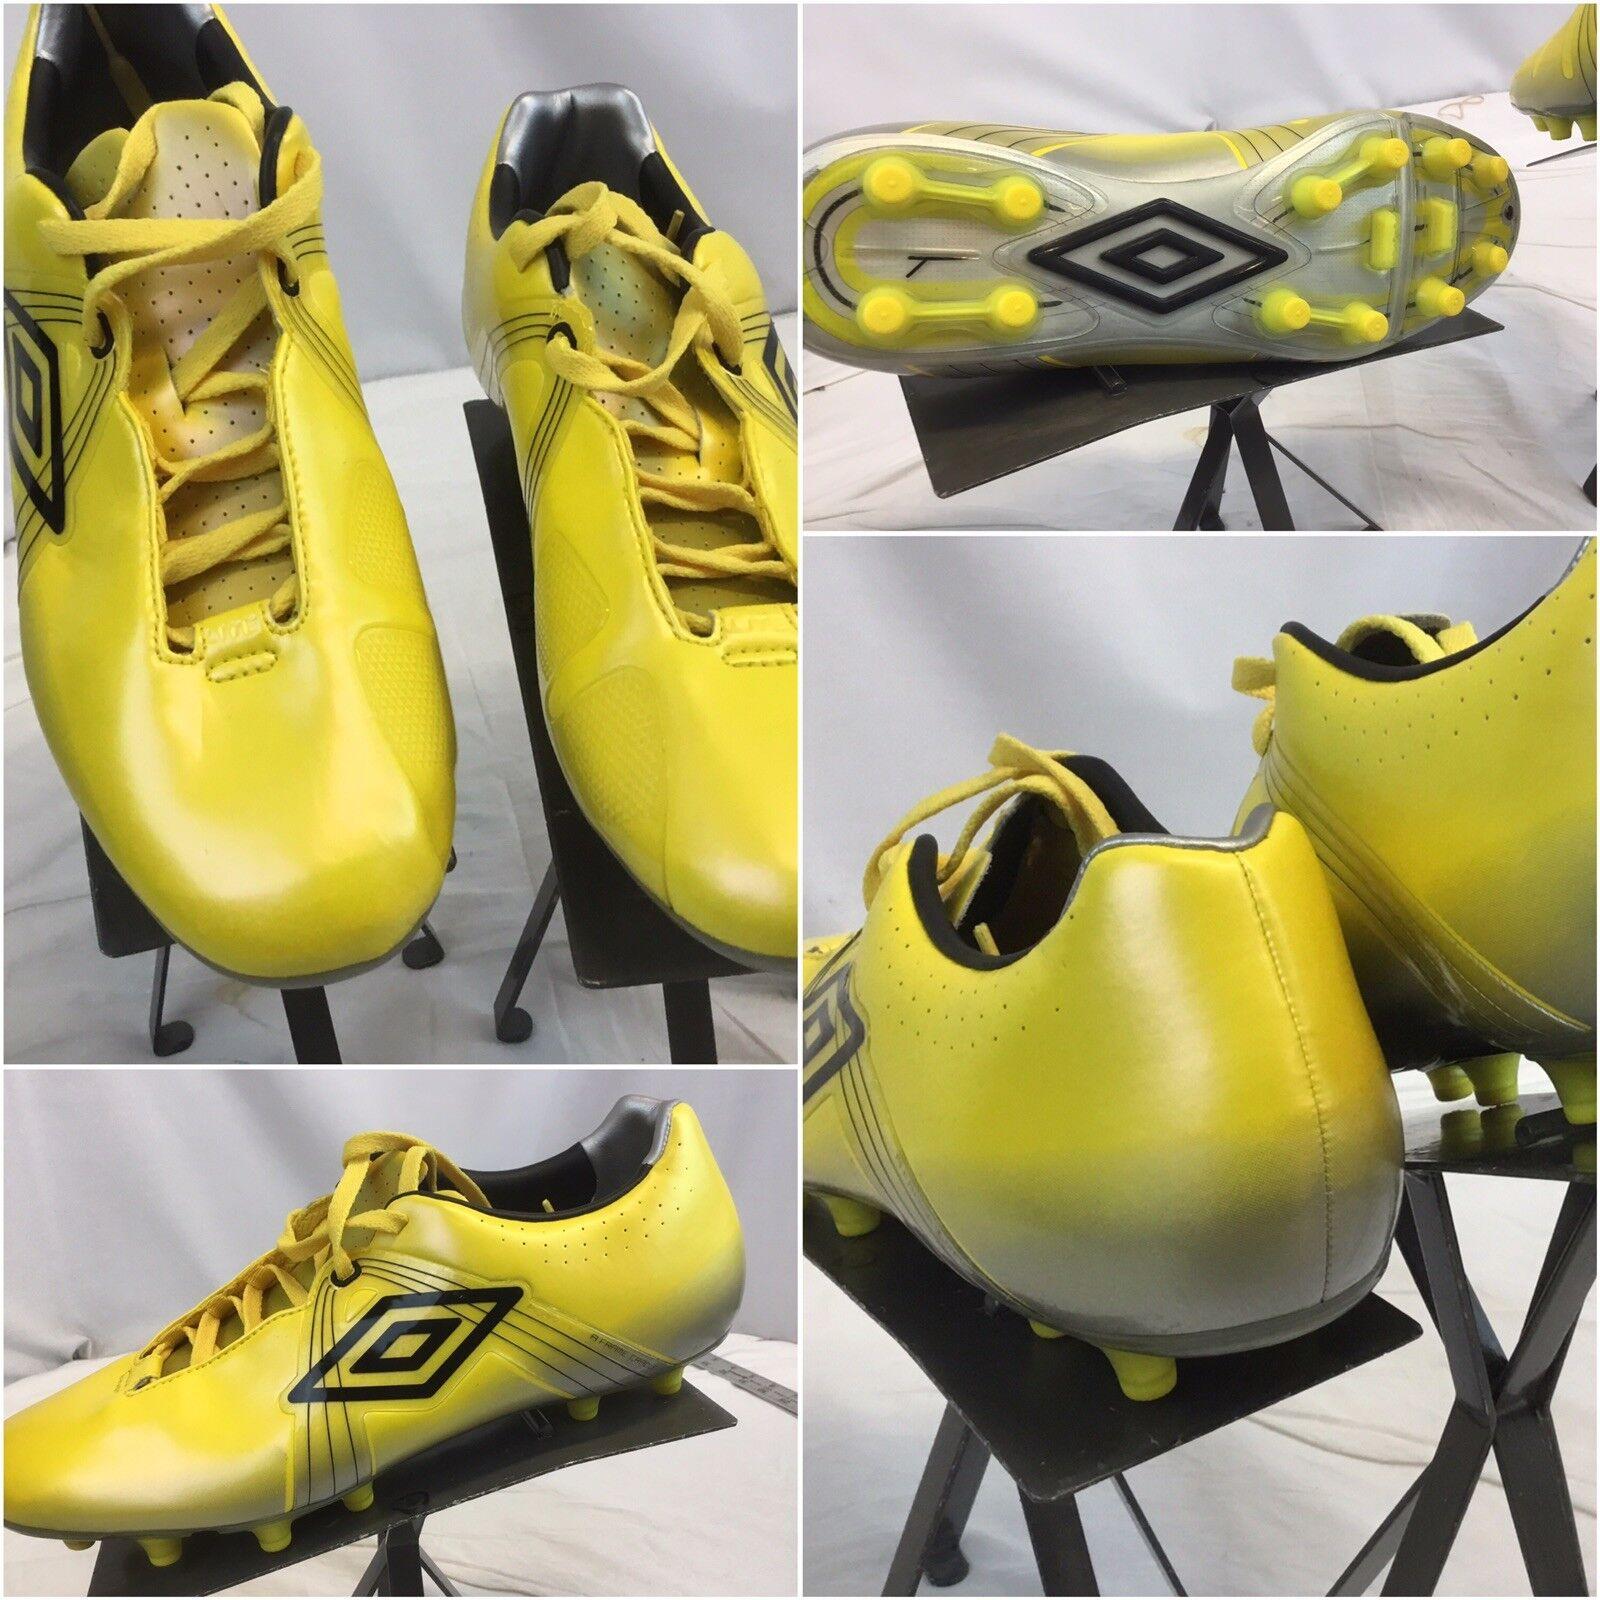 Umbro GT Pro Soccer Cleats Sz 9 giallo NWOT YGI B9S5